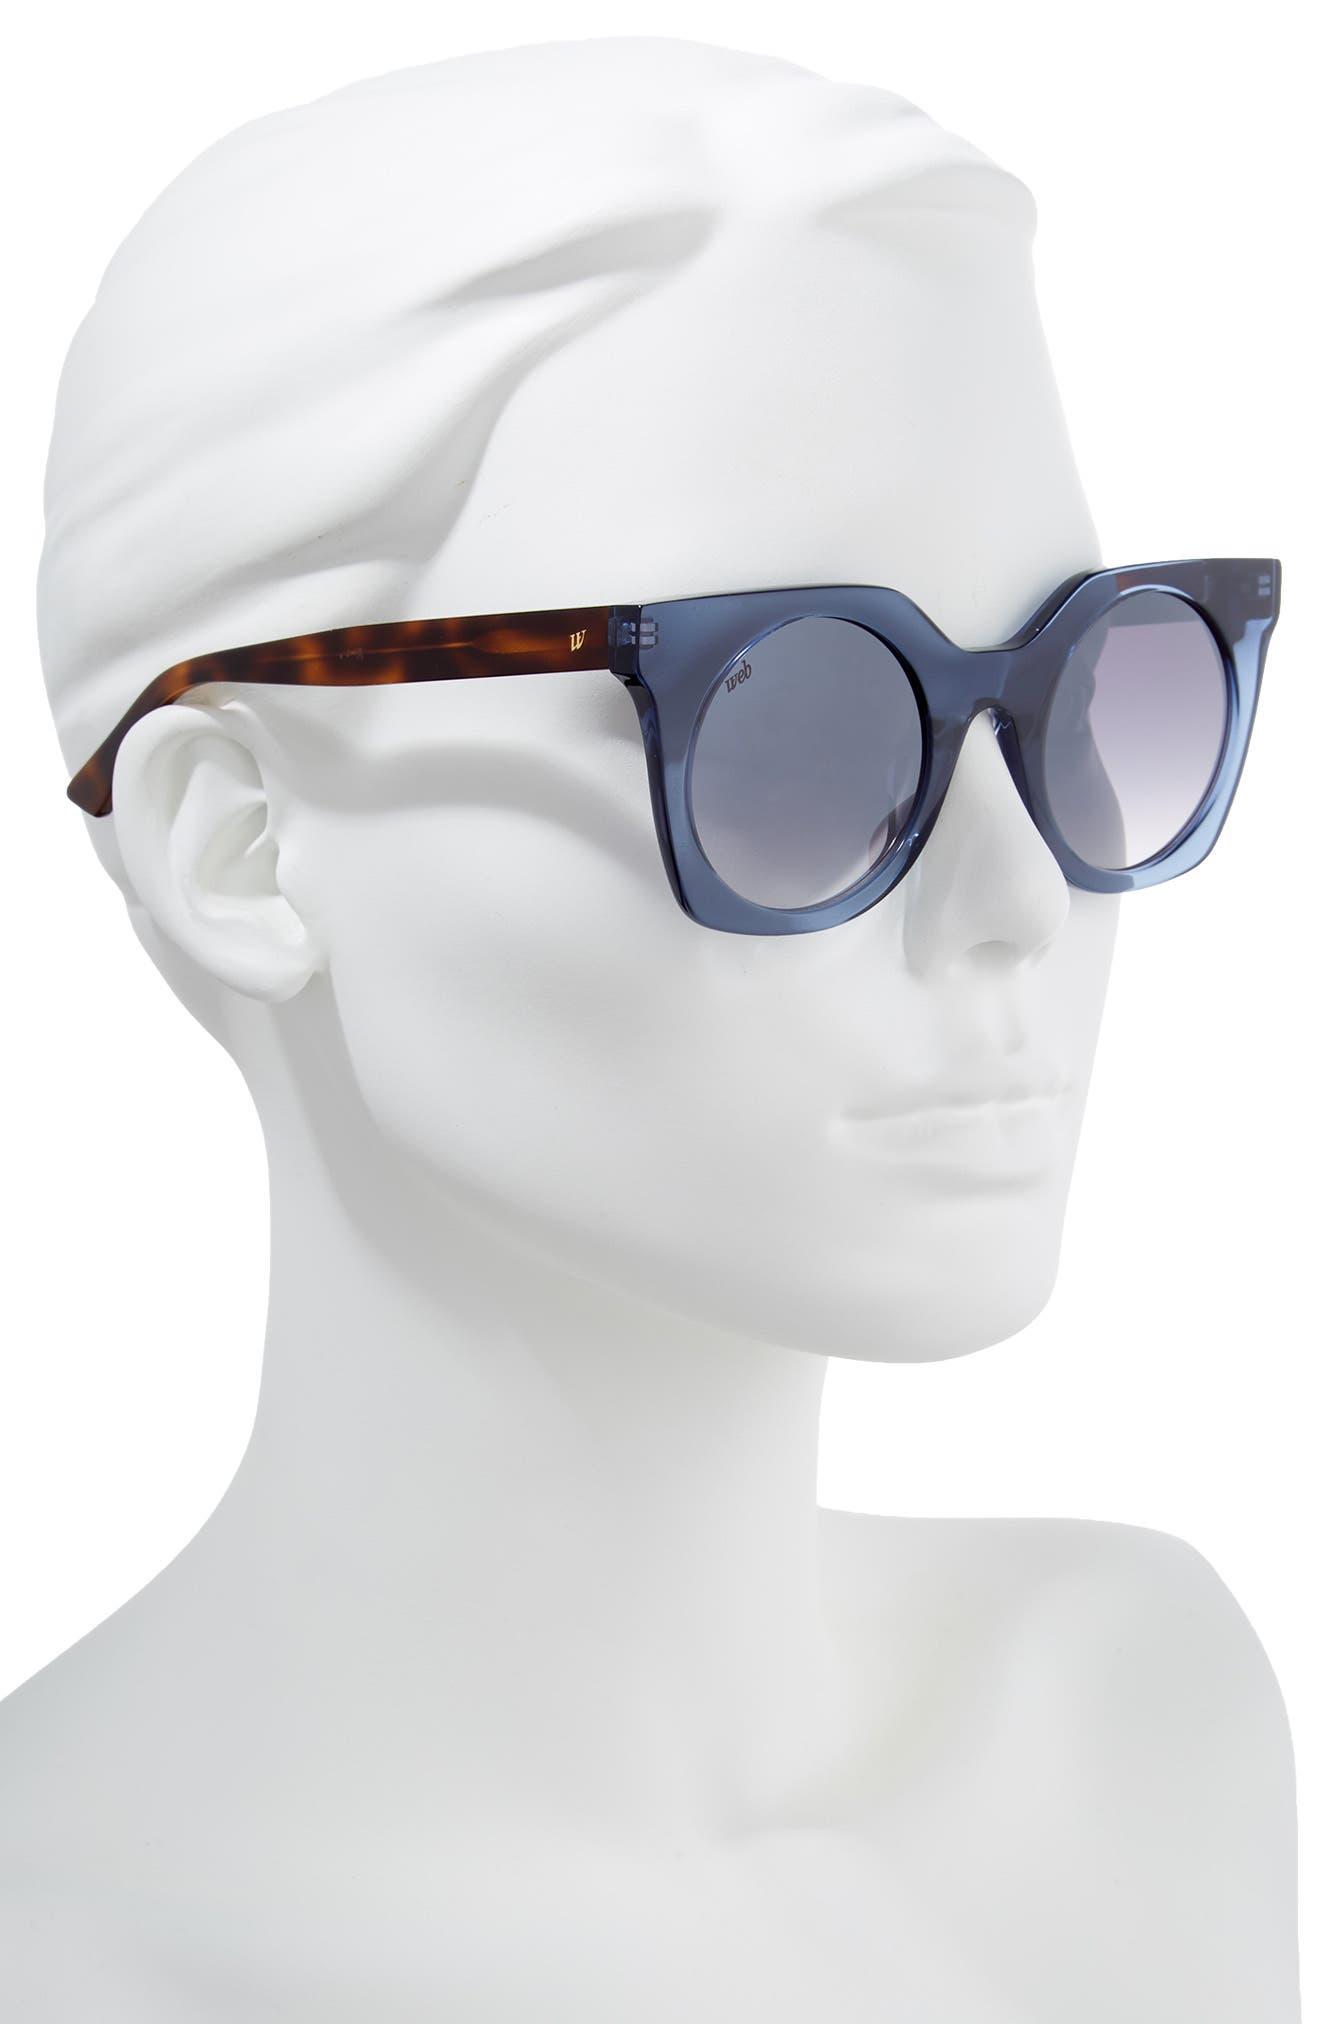 48mm Sunglasses,                             Alternate thumbnail 2, color,                             Shiny Blue/ Blue Mirror